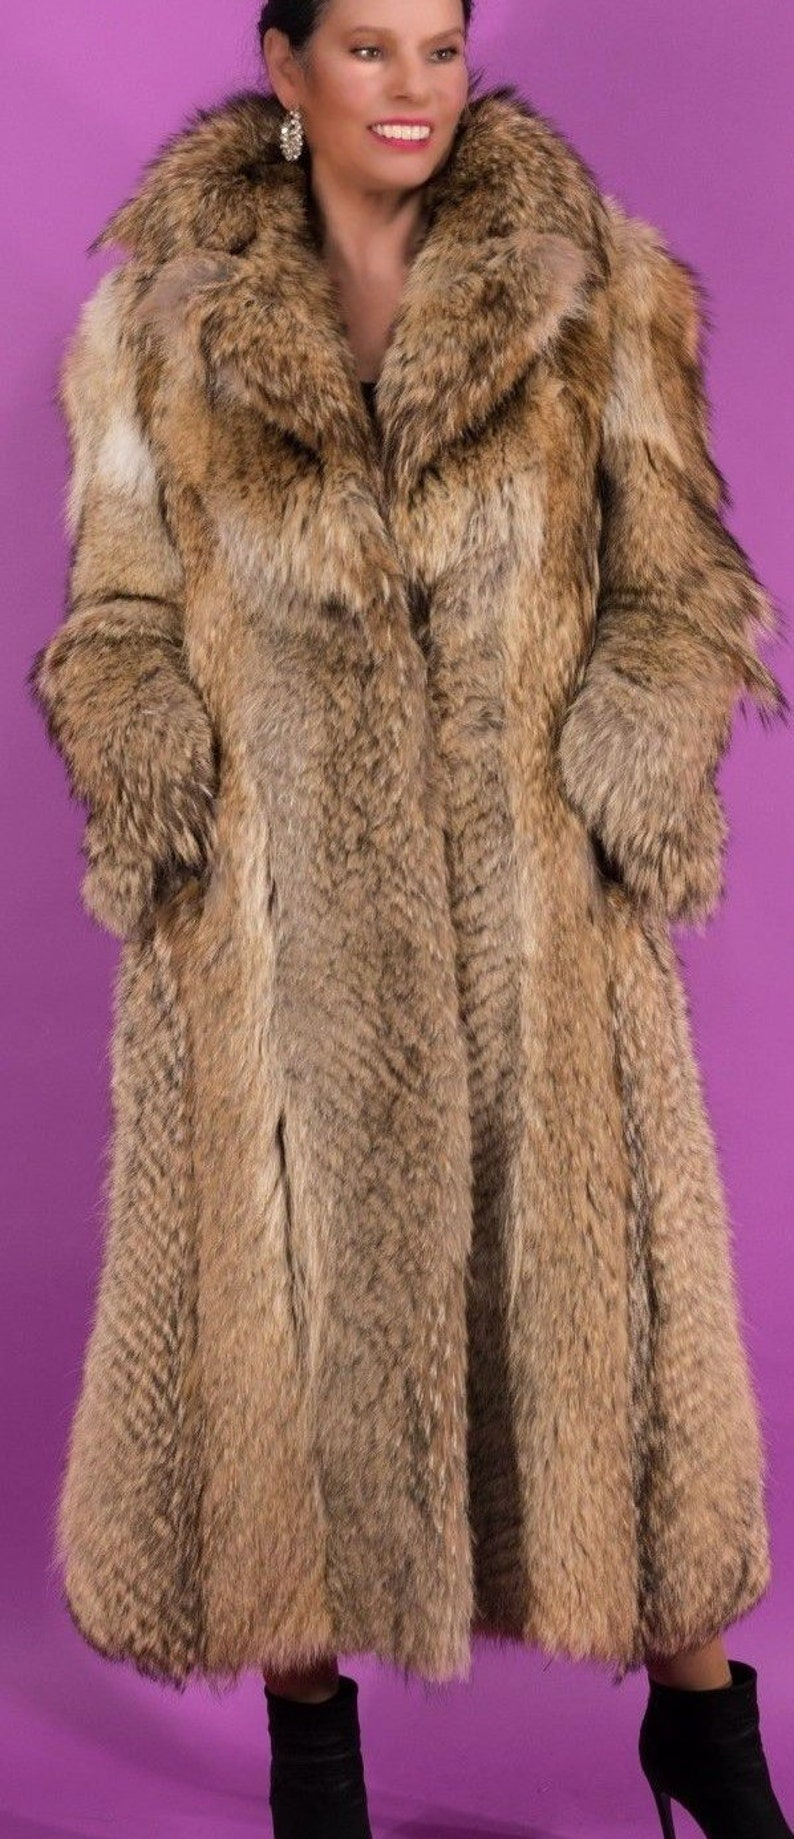 Coyote Fur Coat >> Coyote Fur Coat Full Length Size Small Etsy